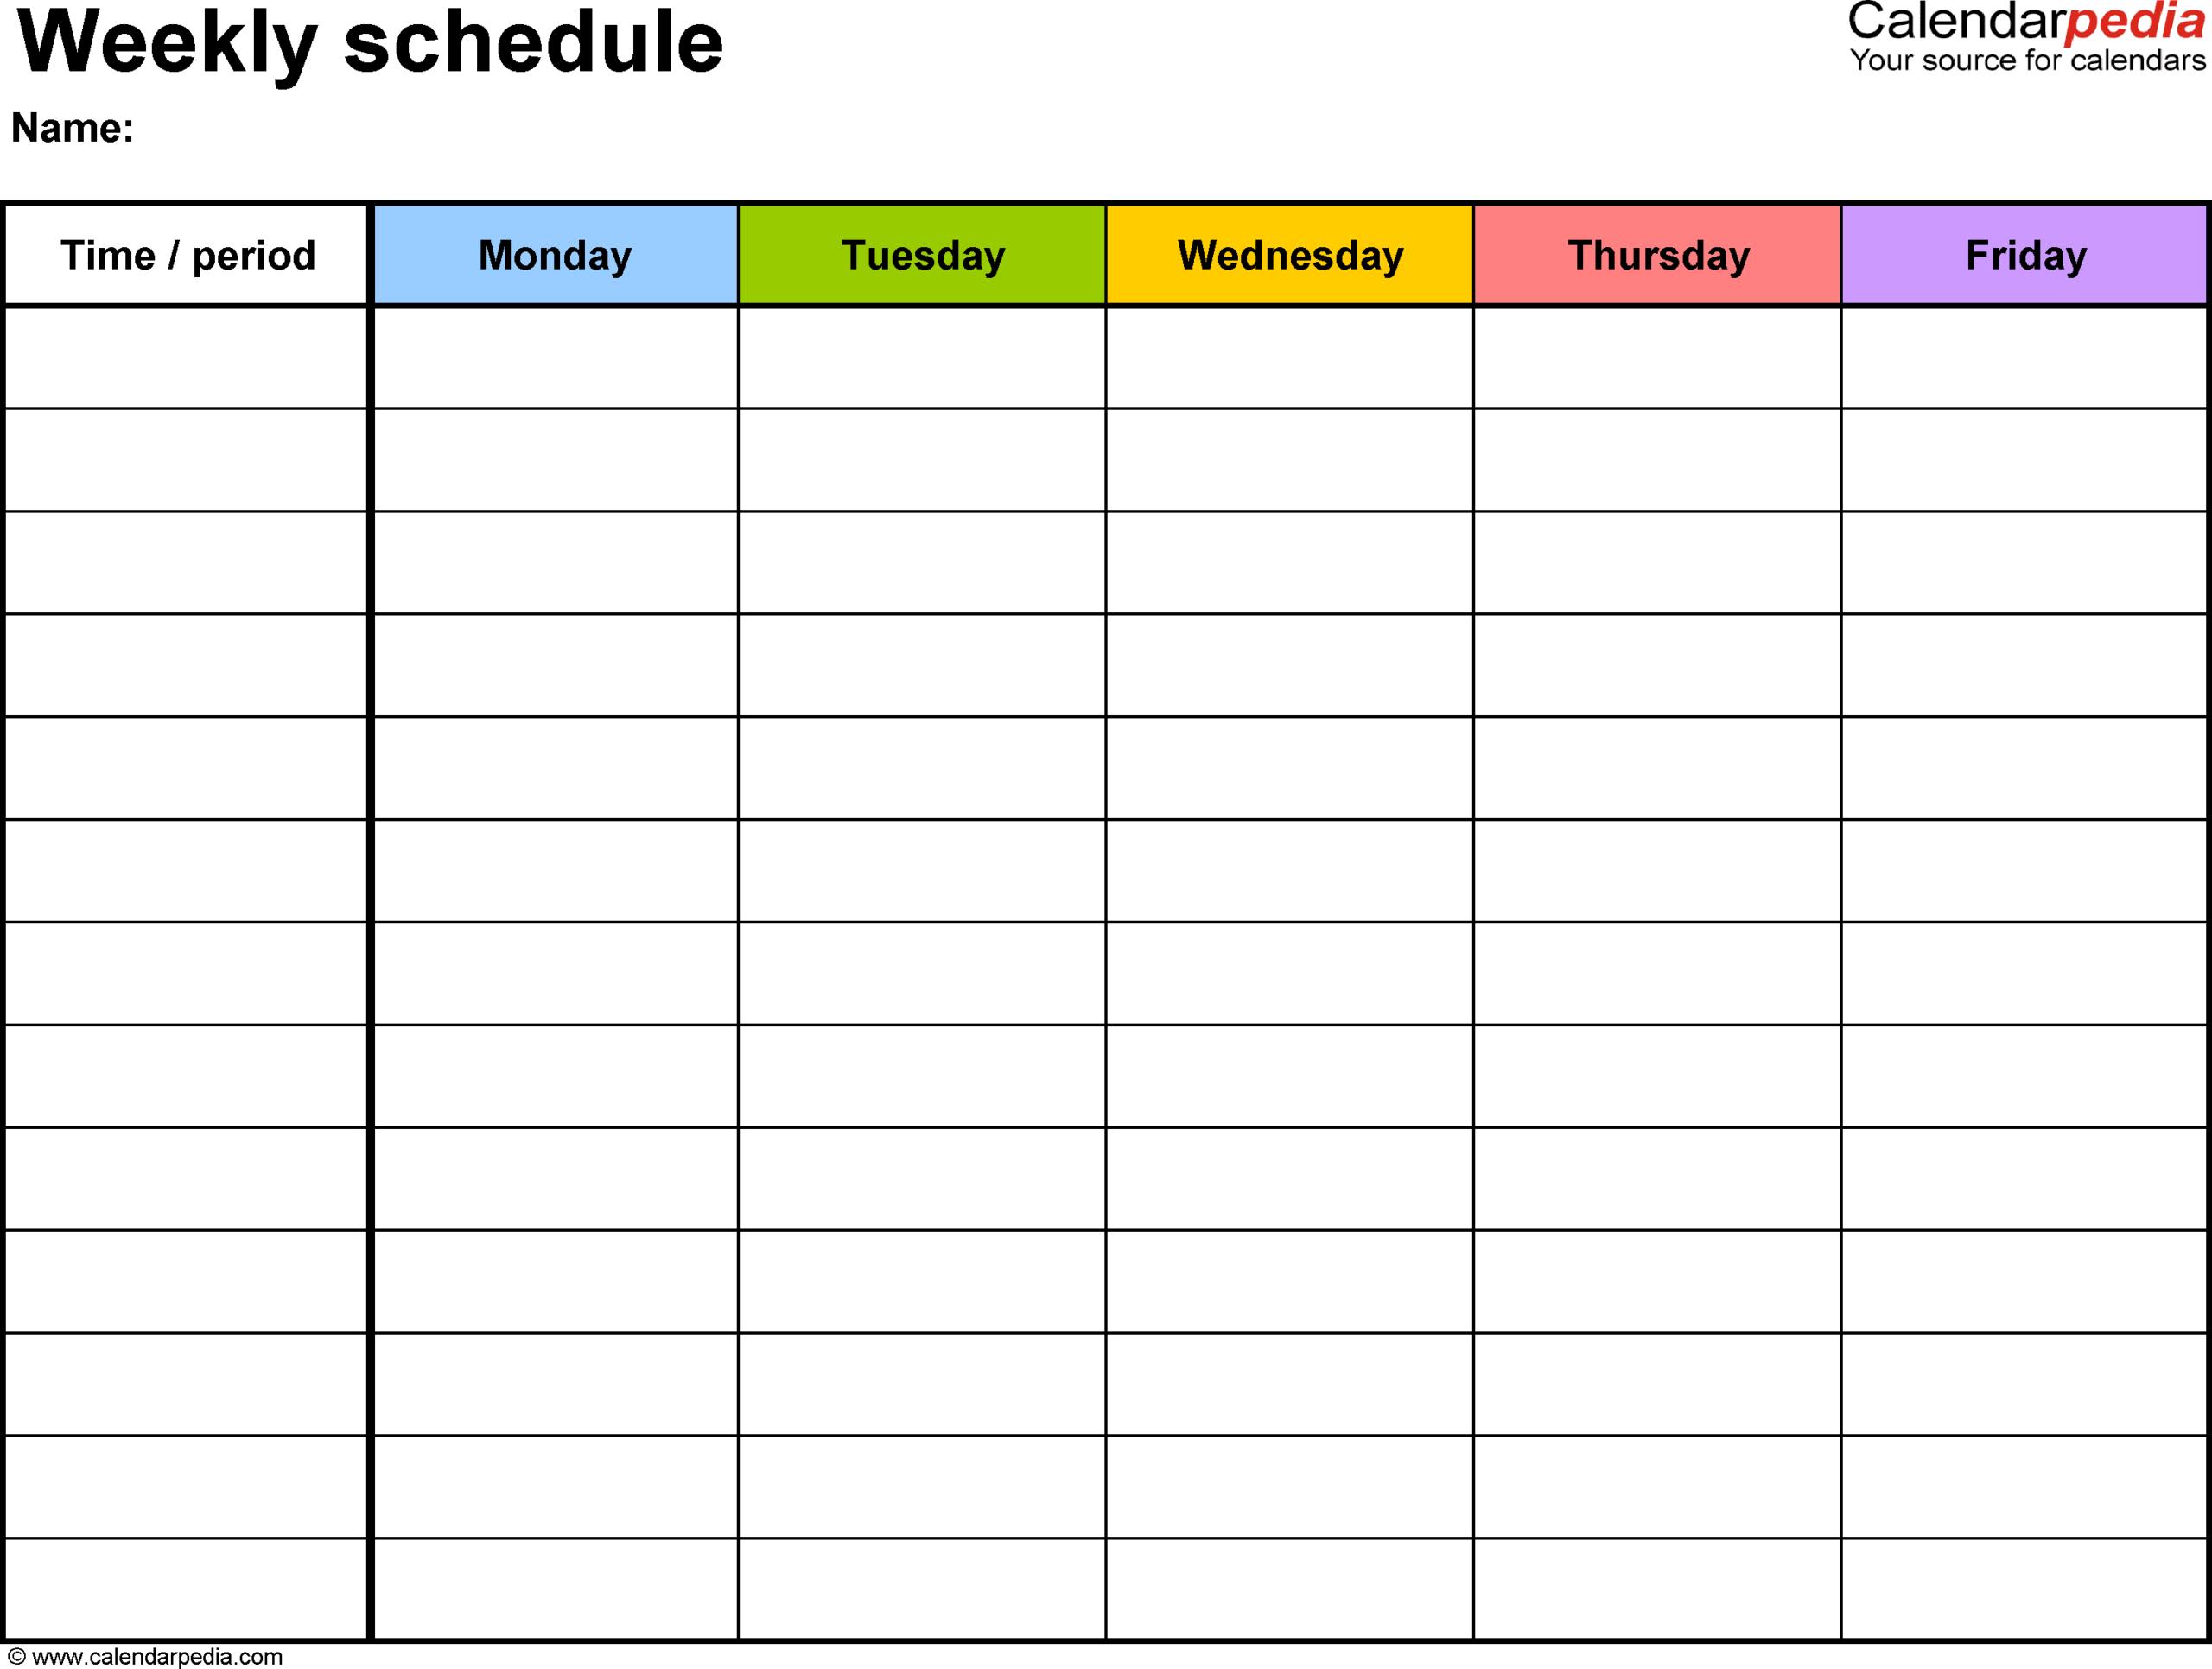 Blank Calendar Print Out • Printable Calendar Template